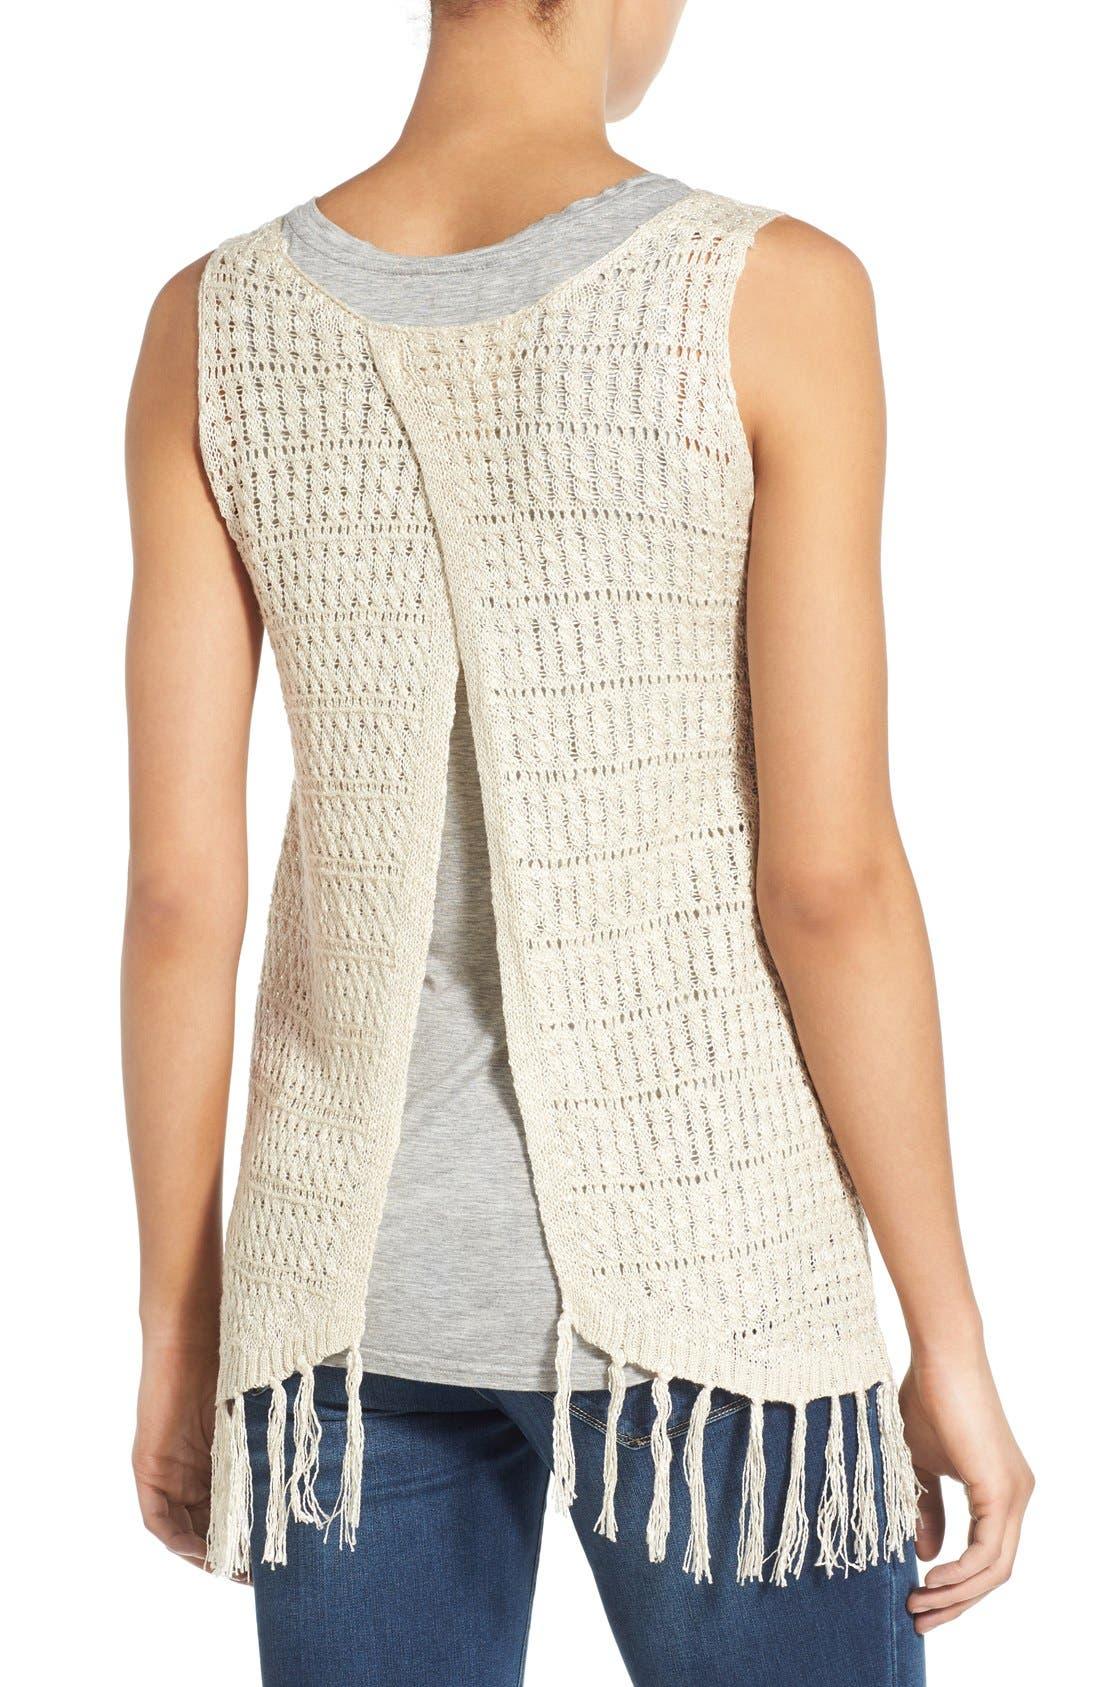 Alternate Image 2  - Wit & Wisdom Fringed Split Back Open Weave Sweater (Nordstrom Exclusive)